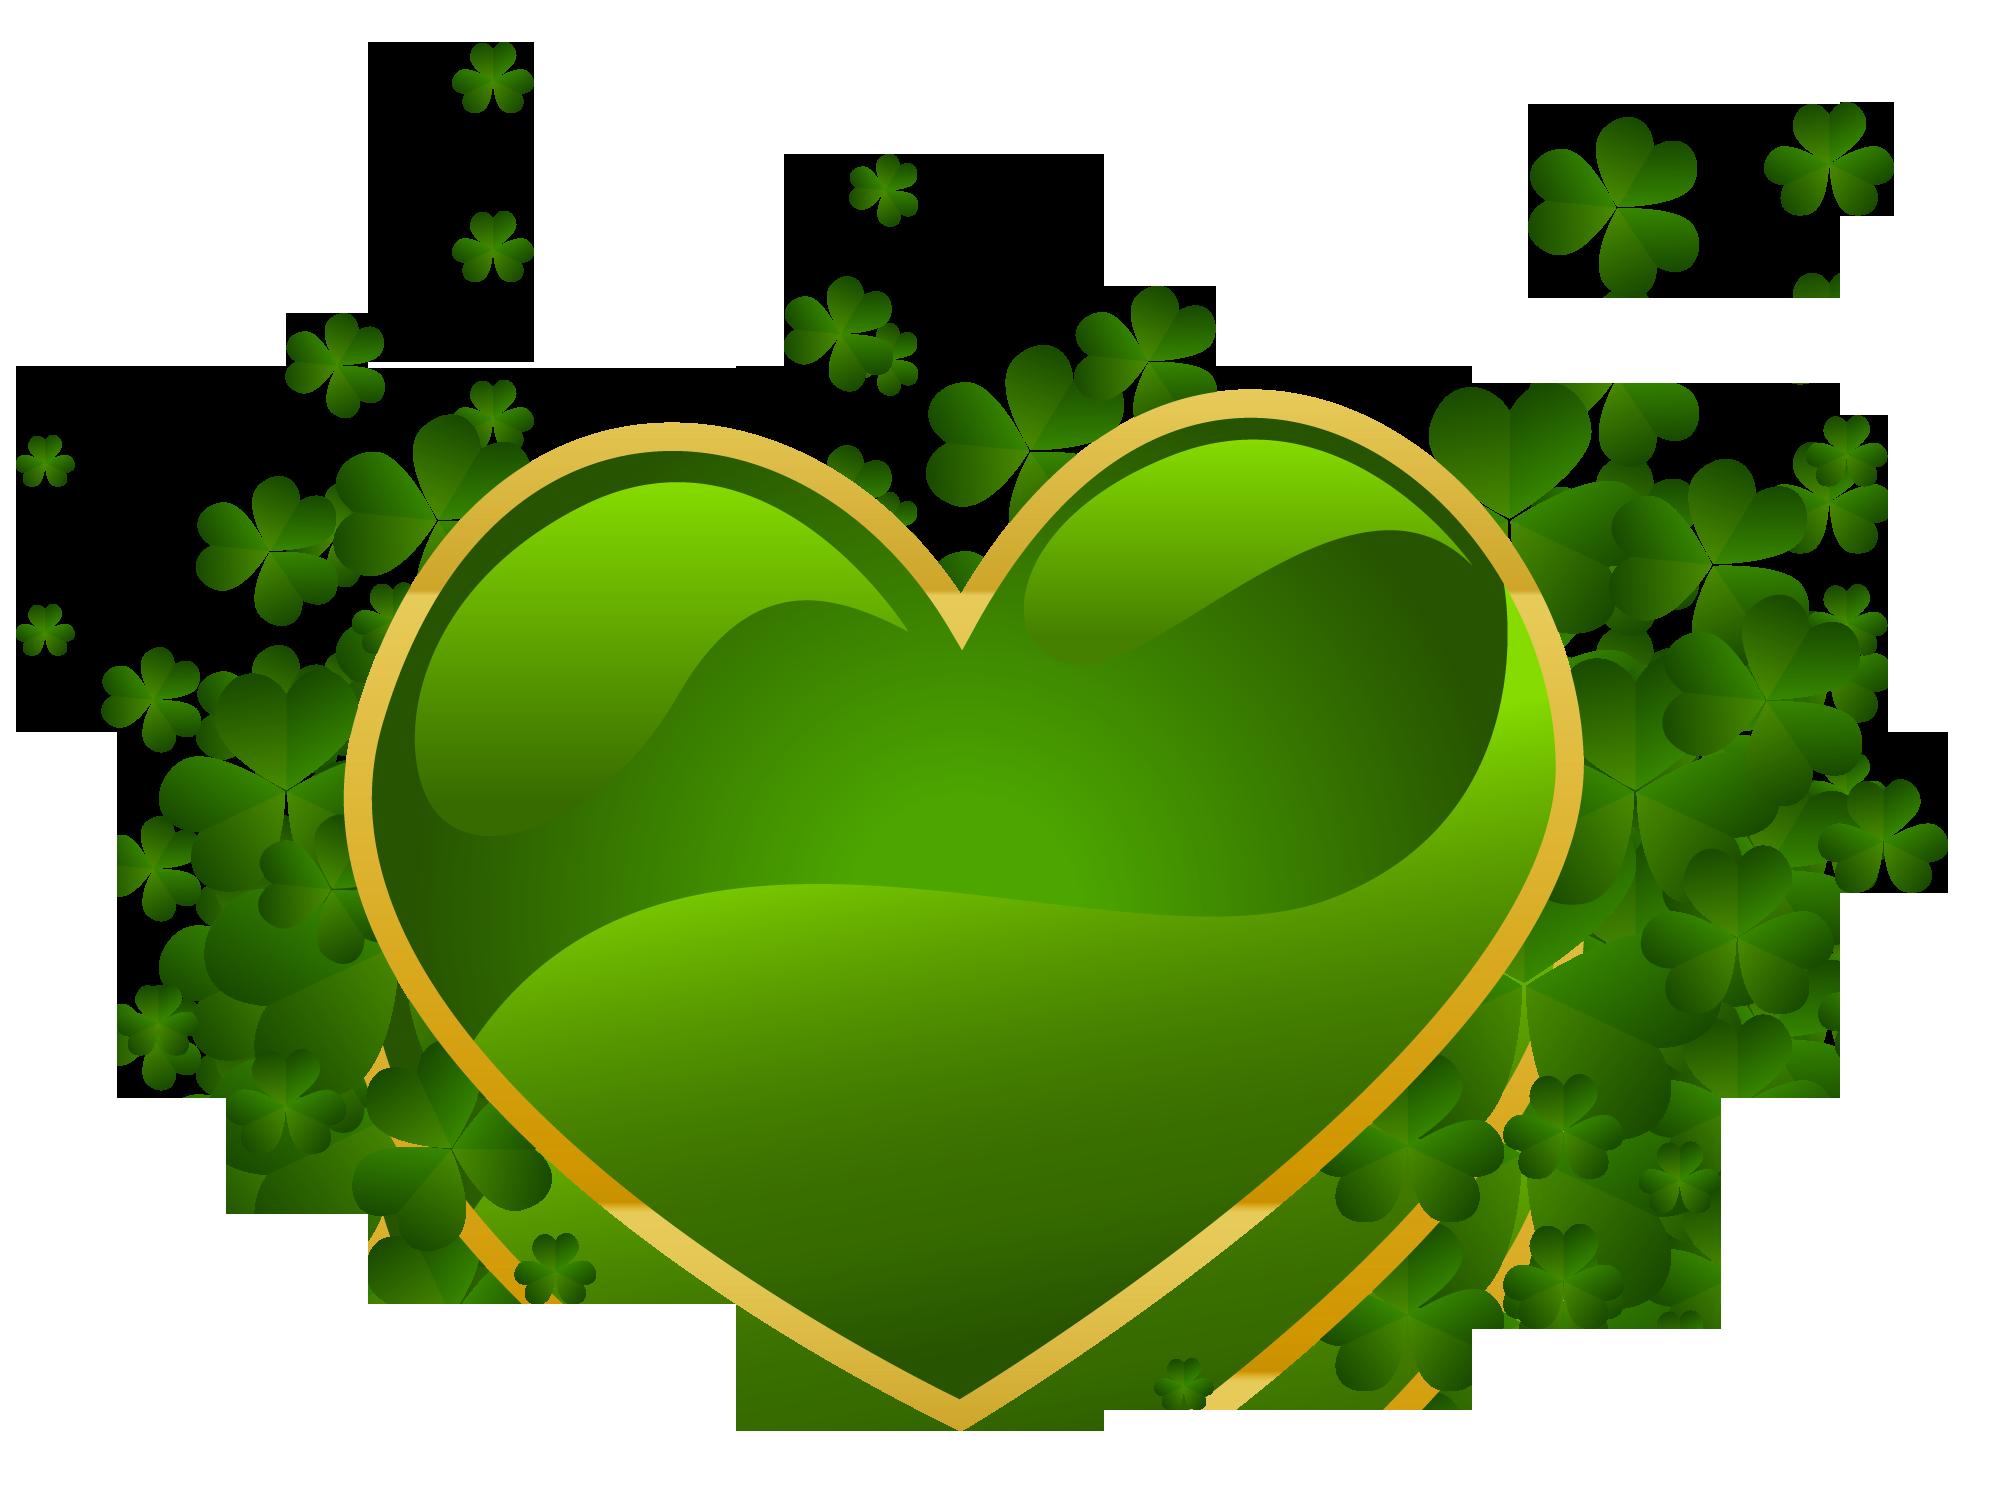 Green fancy hearts clipart clip 17 Best ideas about Shamrock Clipart on Pinterest | St patrick's ... clip